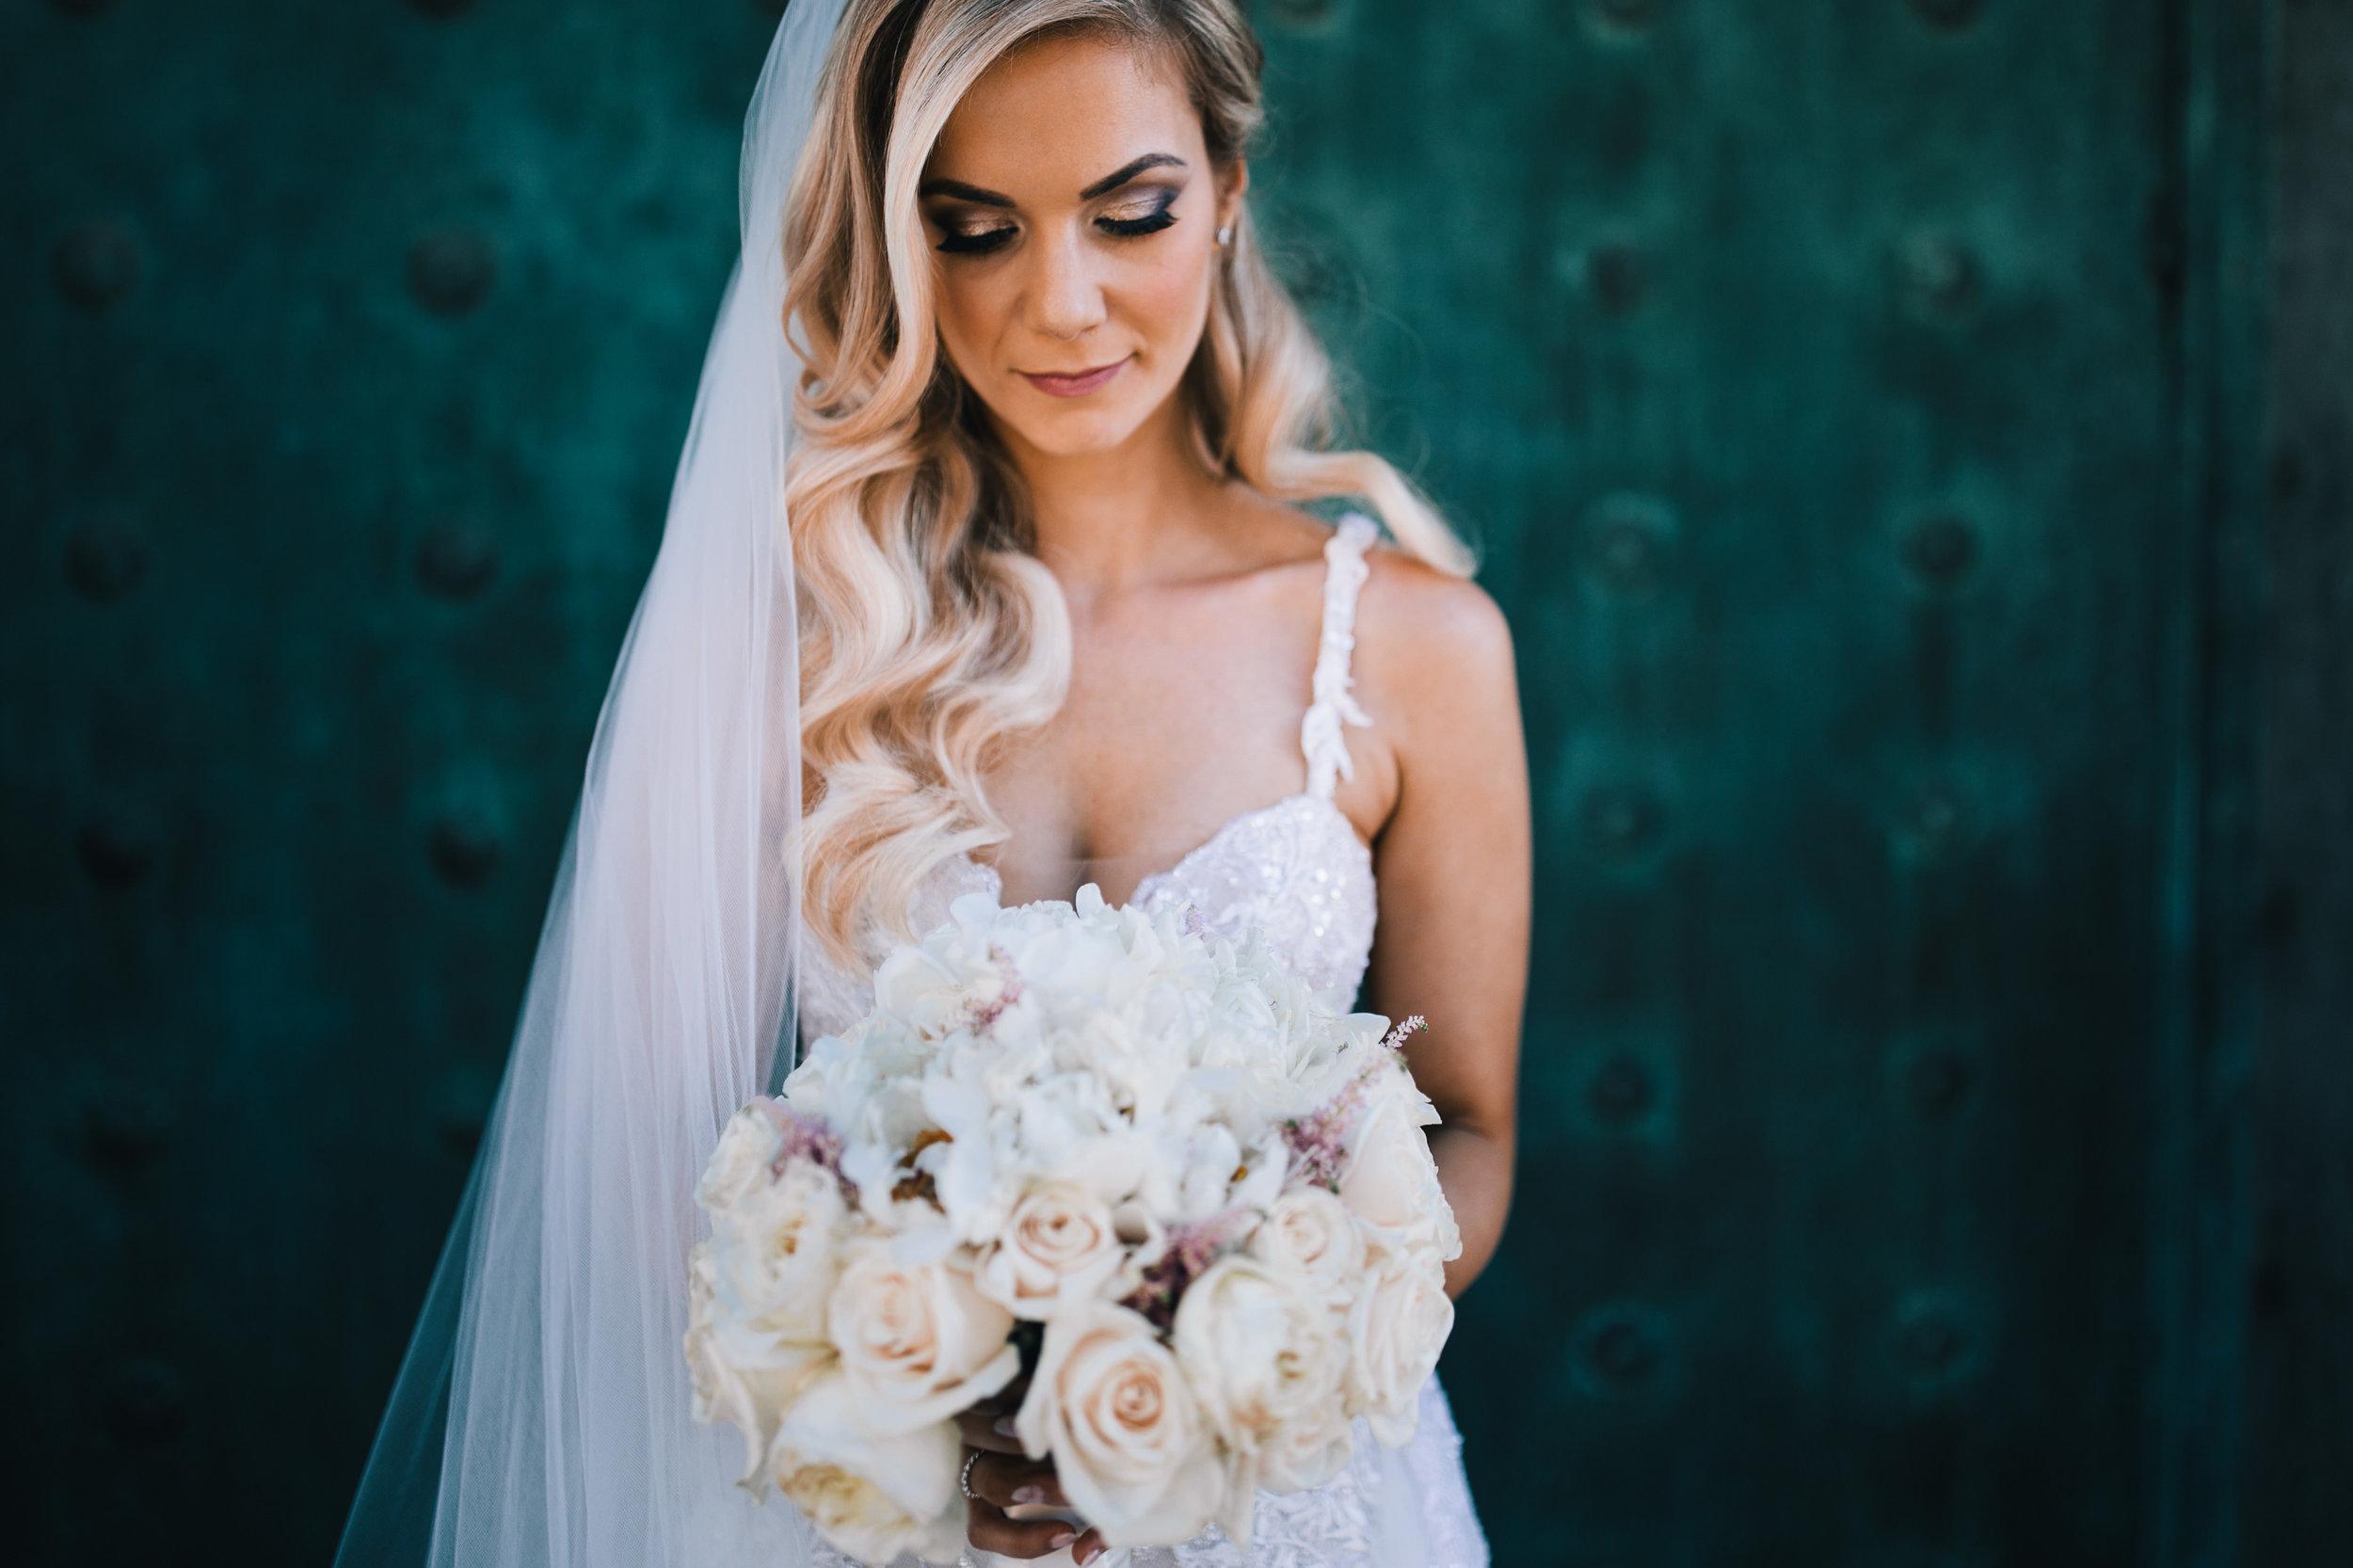 2018.09.08 Litsa and Sofo Greek Wedding Sneak Peak-6.jpg